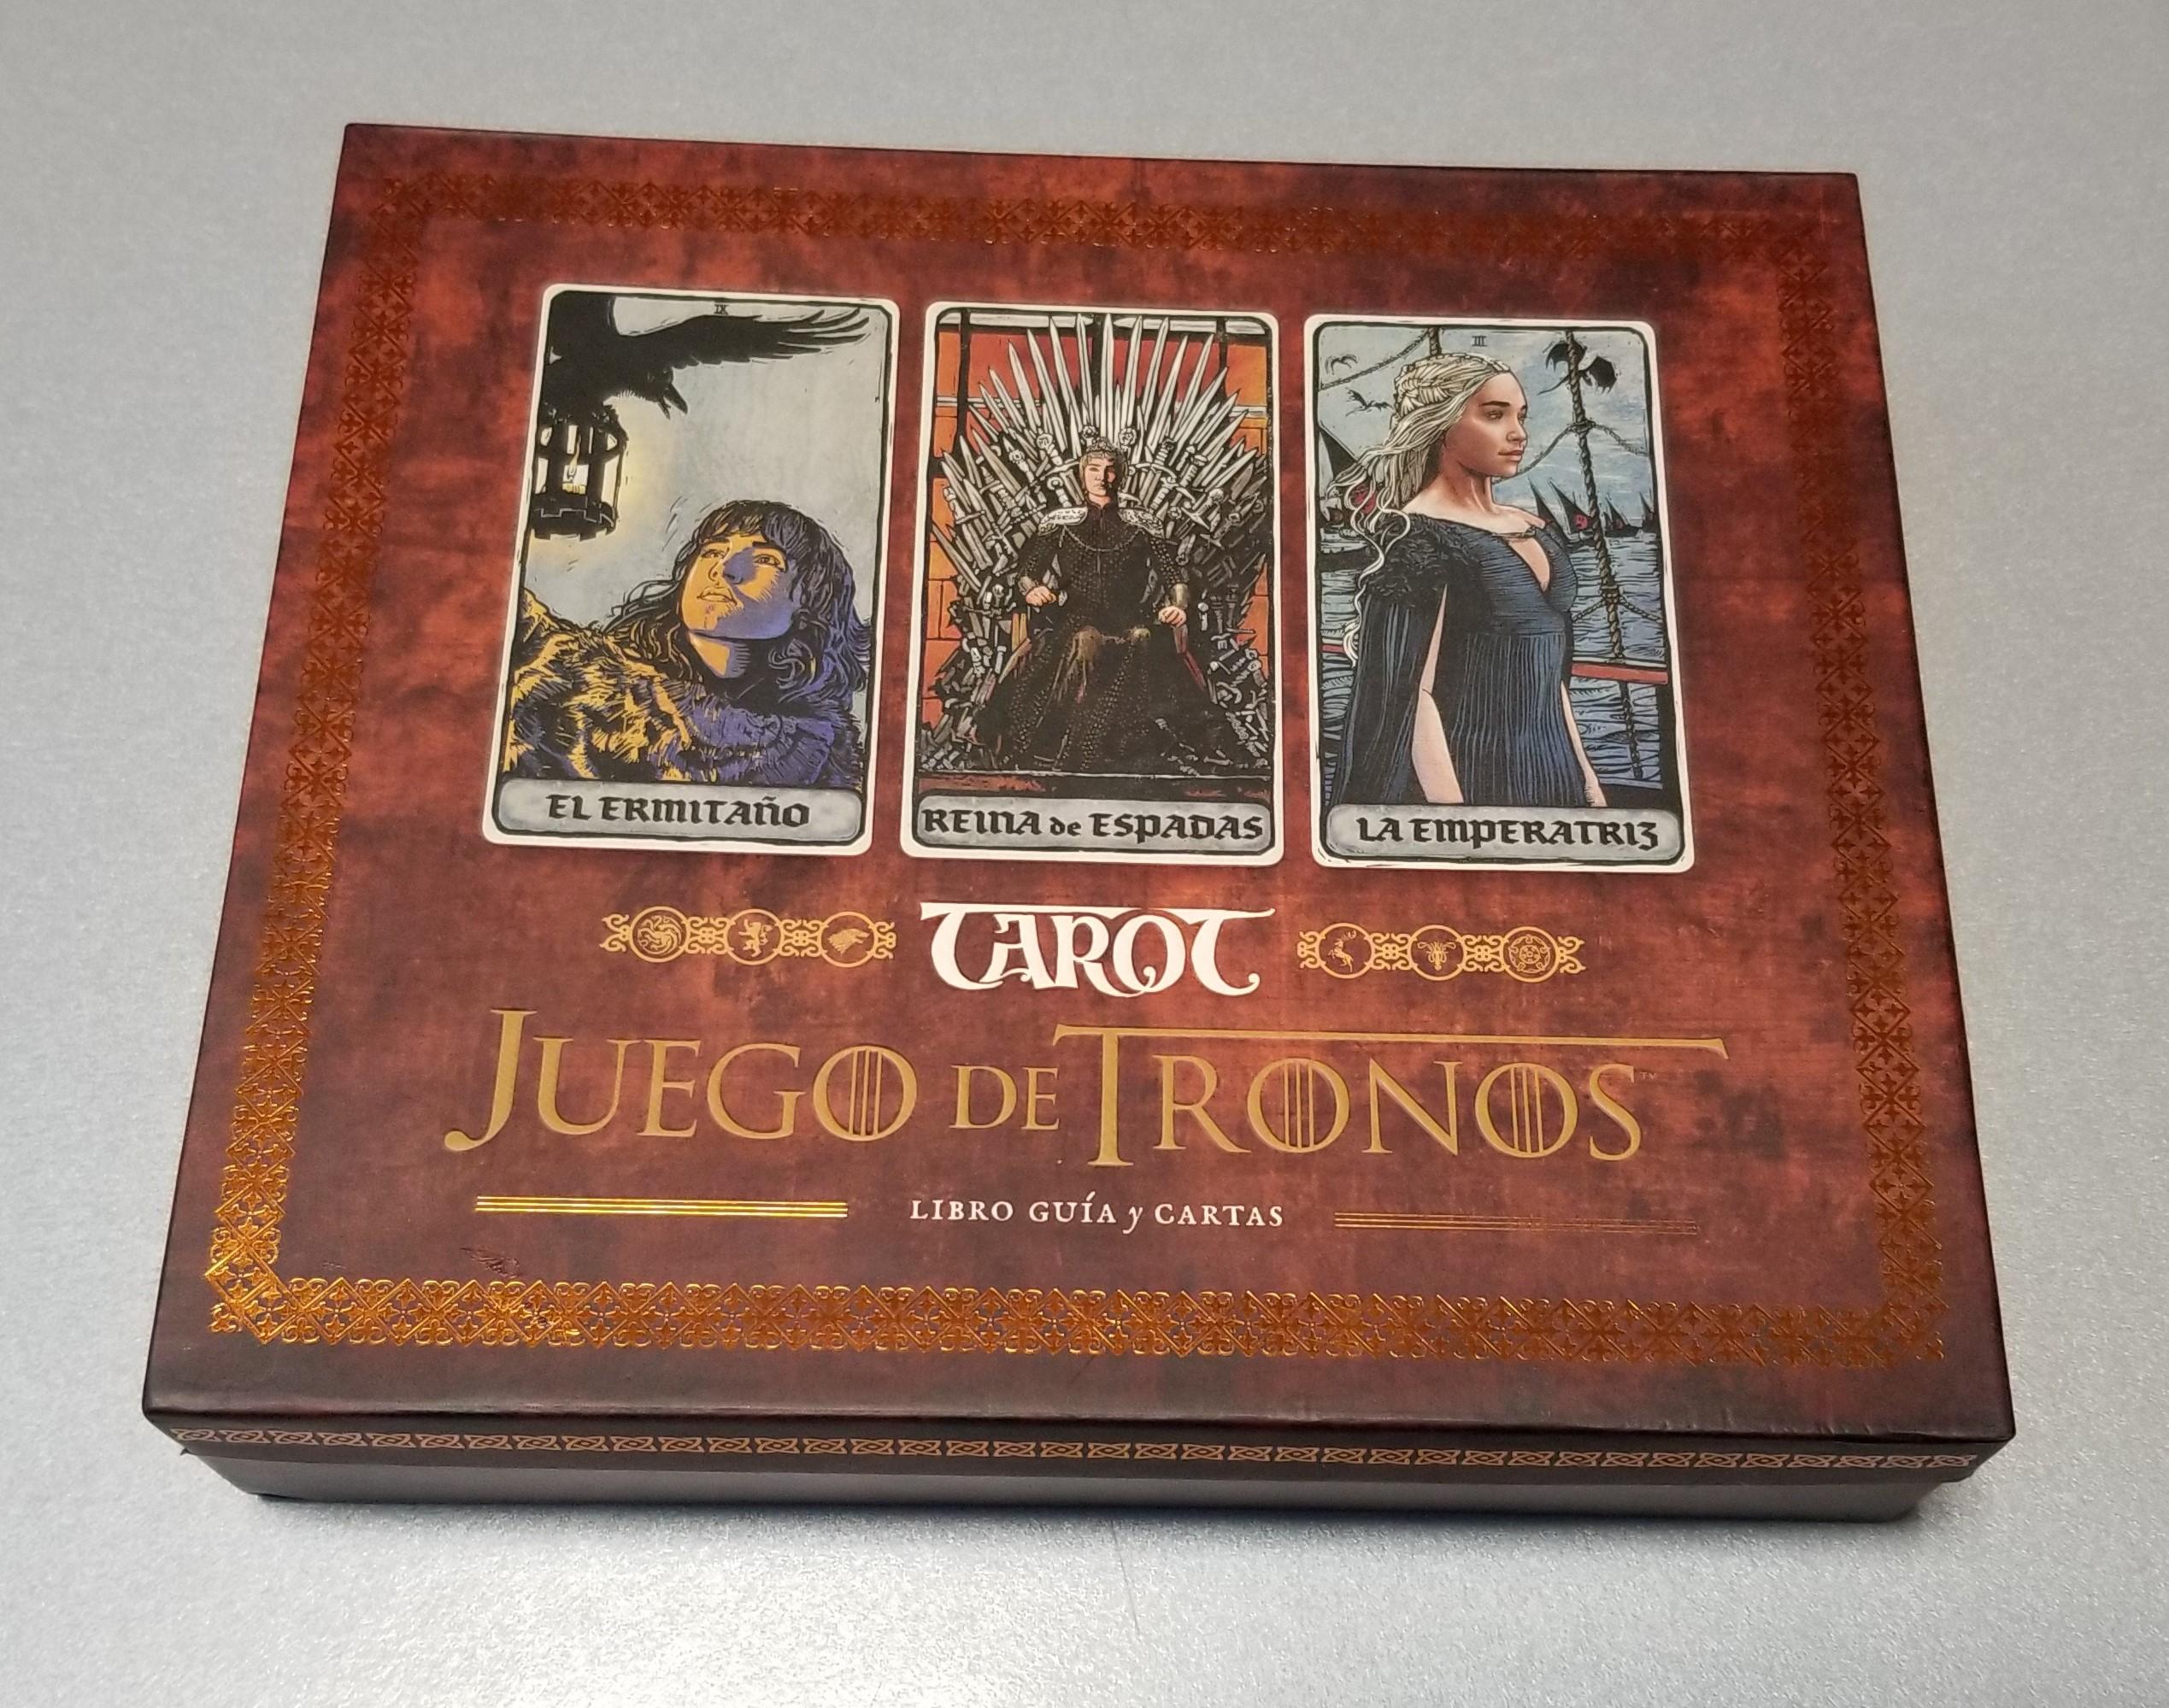 TAROT JUEGO DE TRONOS - LIBRO GUIA Y CARTAS